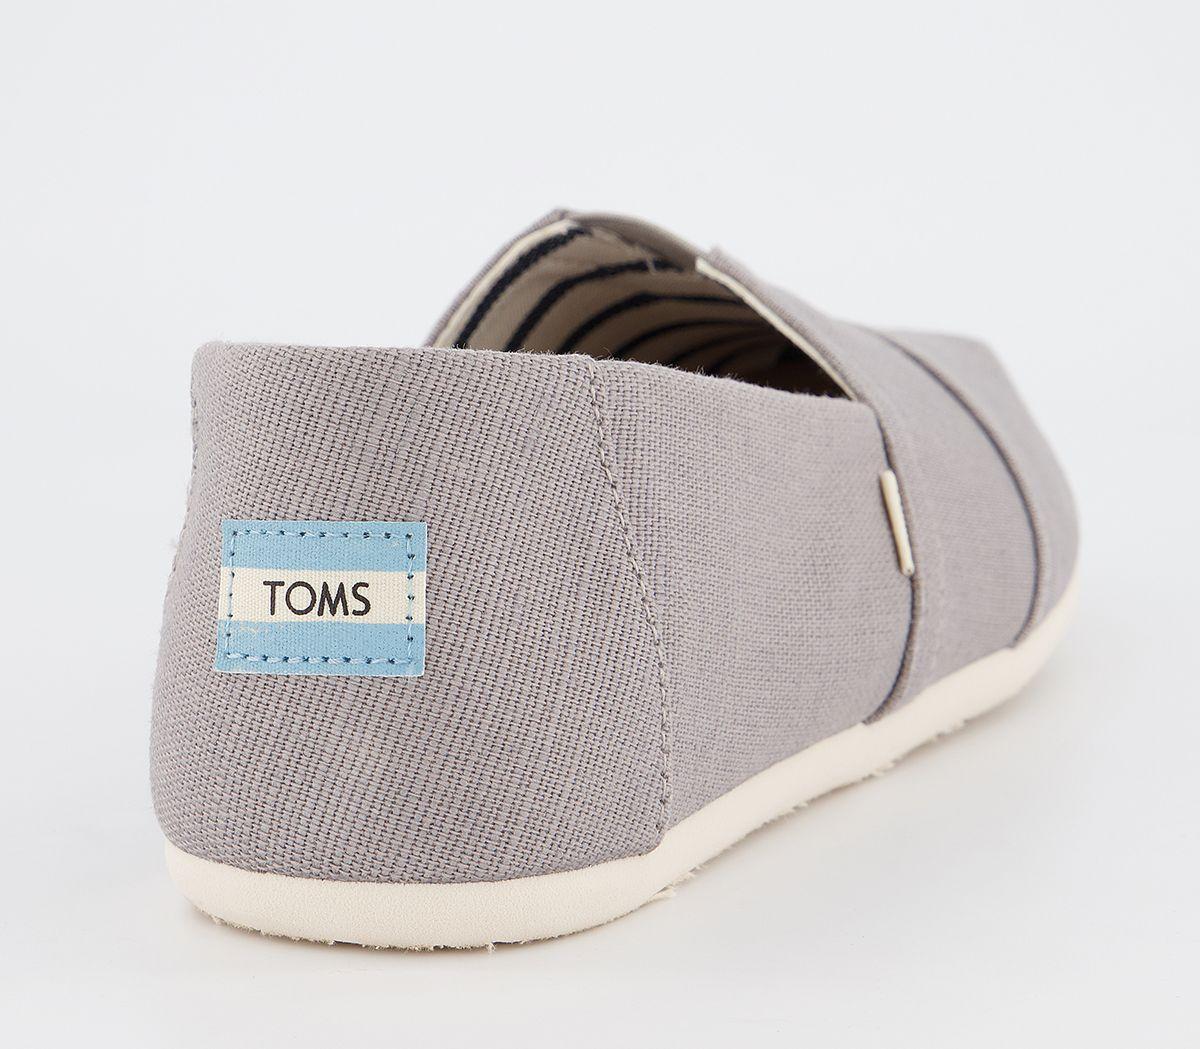 Da-Uomo-Toms-Toms-Classic-SLIP-ONS-TORTORA-Heritage-Scarpe-Casual miniatura 4